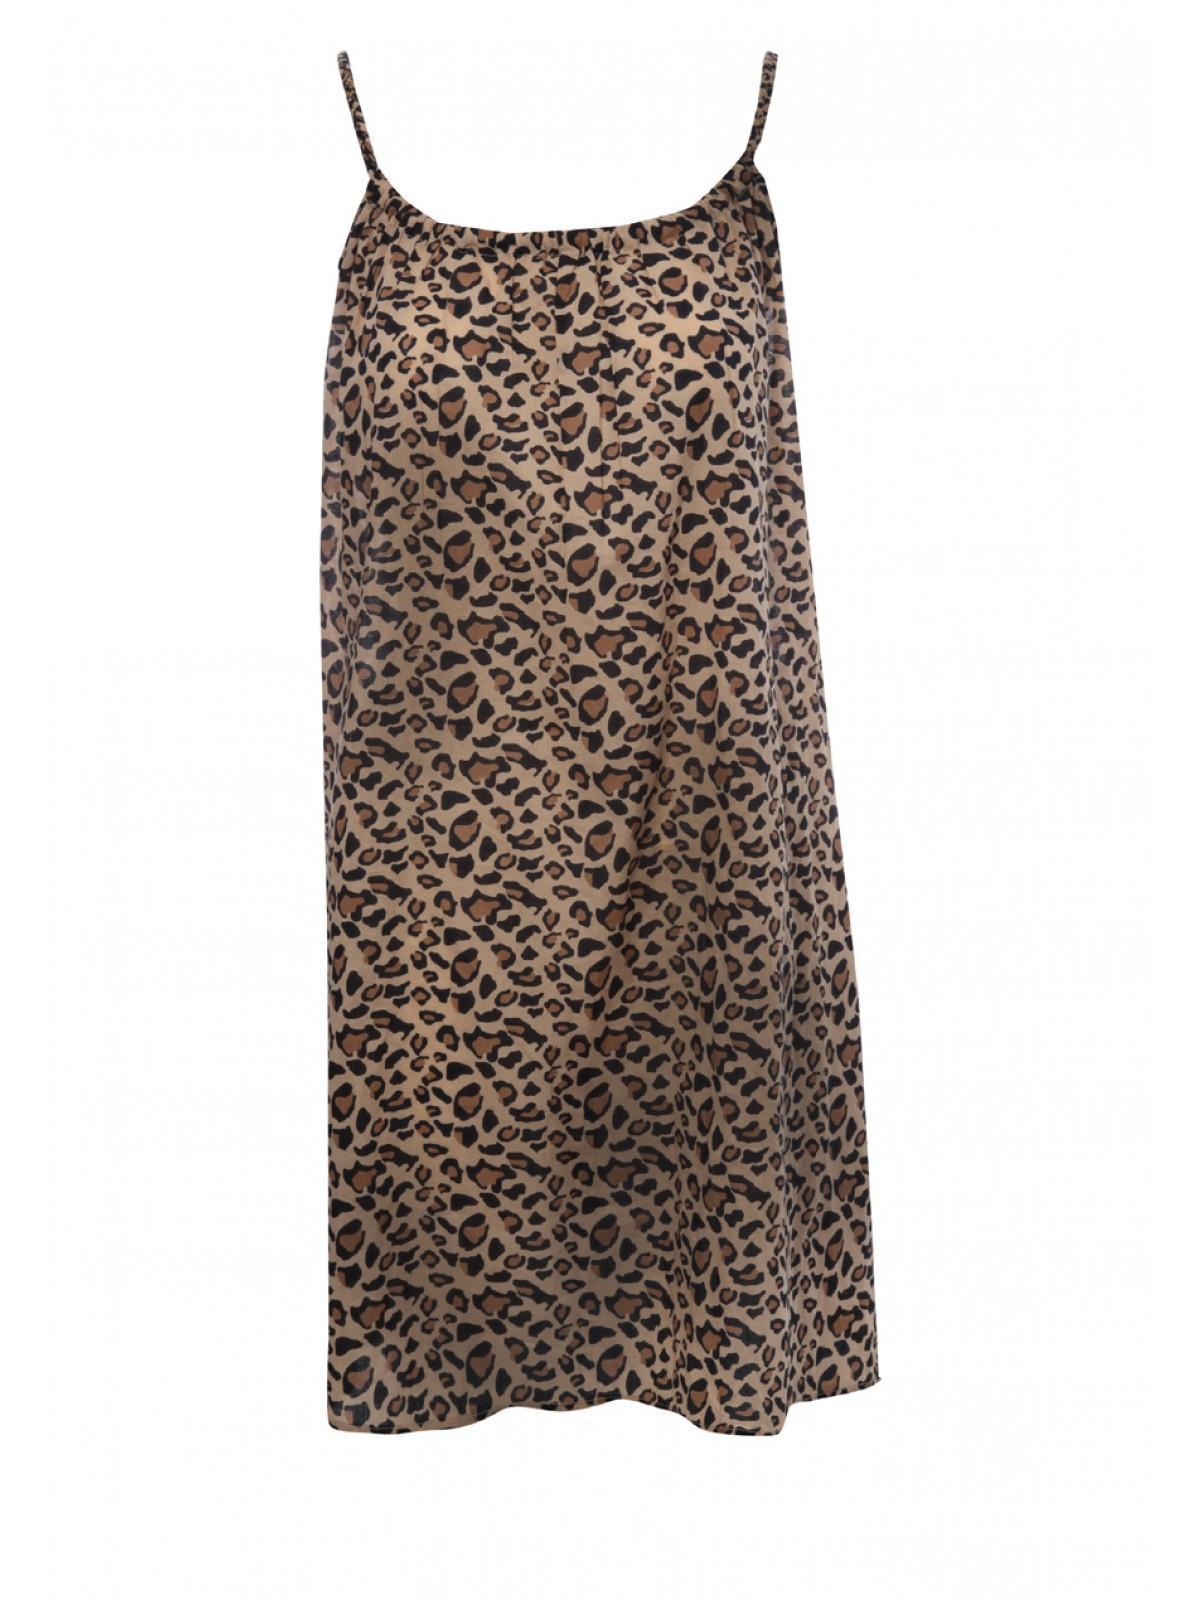 08d3a5246f Home; Womens Beach Dress. Back. PreviousNext